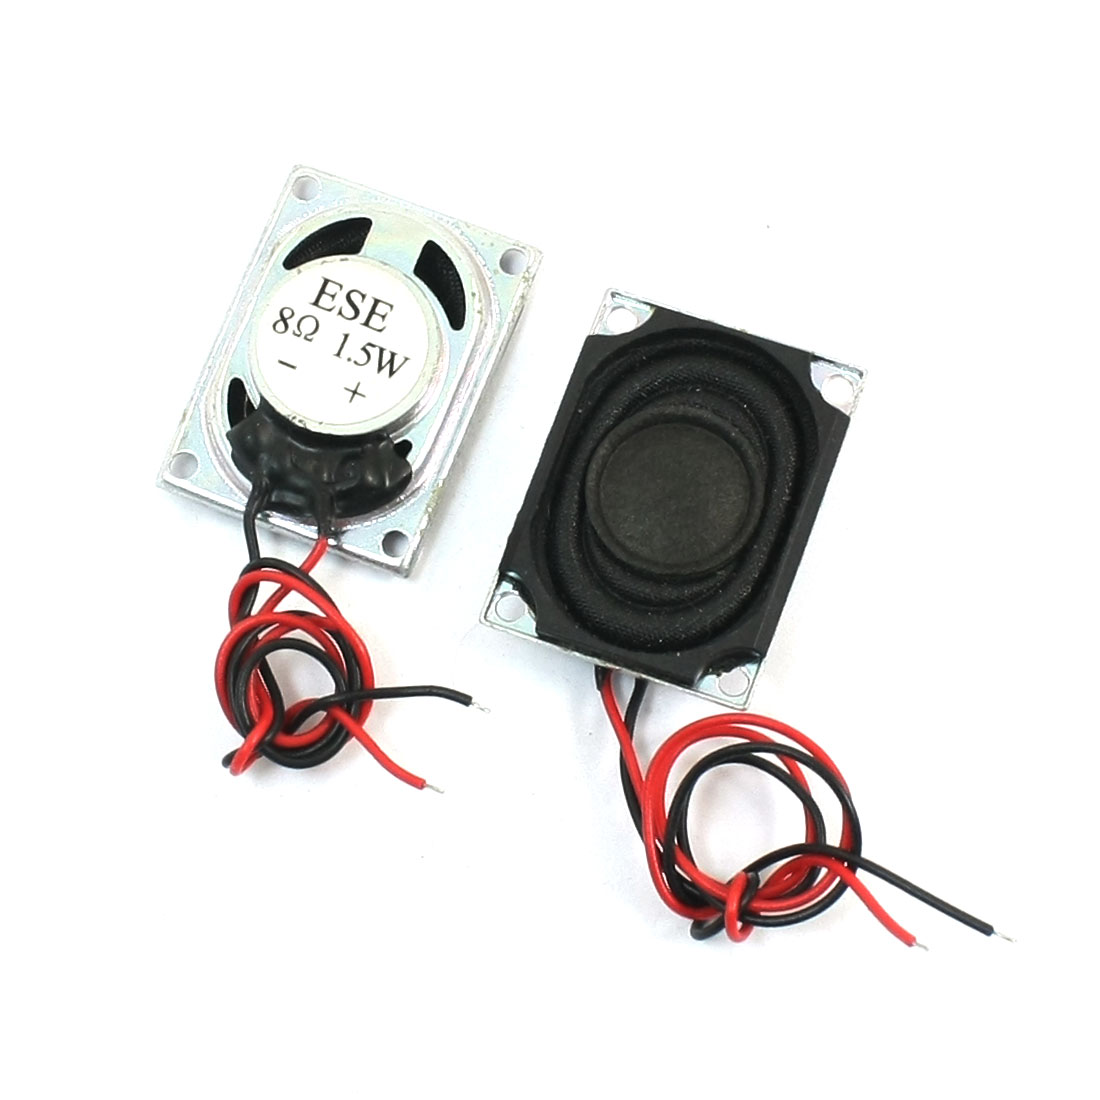 2Pcs 1.5Watt 8 Ohm 2-Wired Rectangle Metal Case Speaker Loudspeaker Amplifier Horn 27mm x 20mm for Music Player